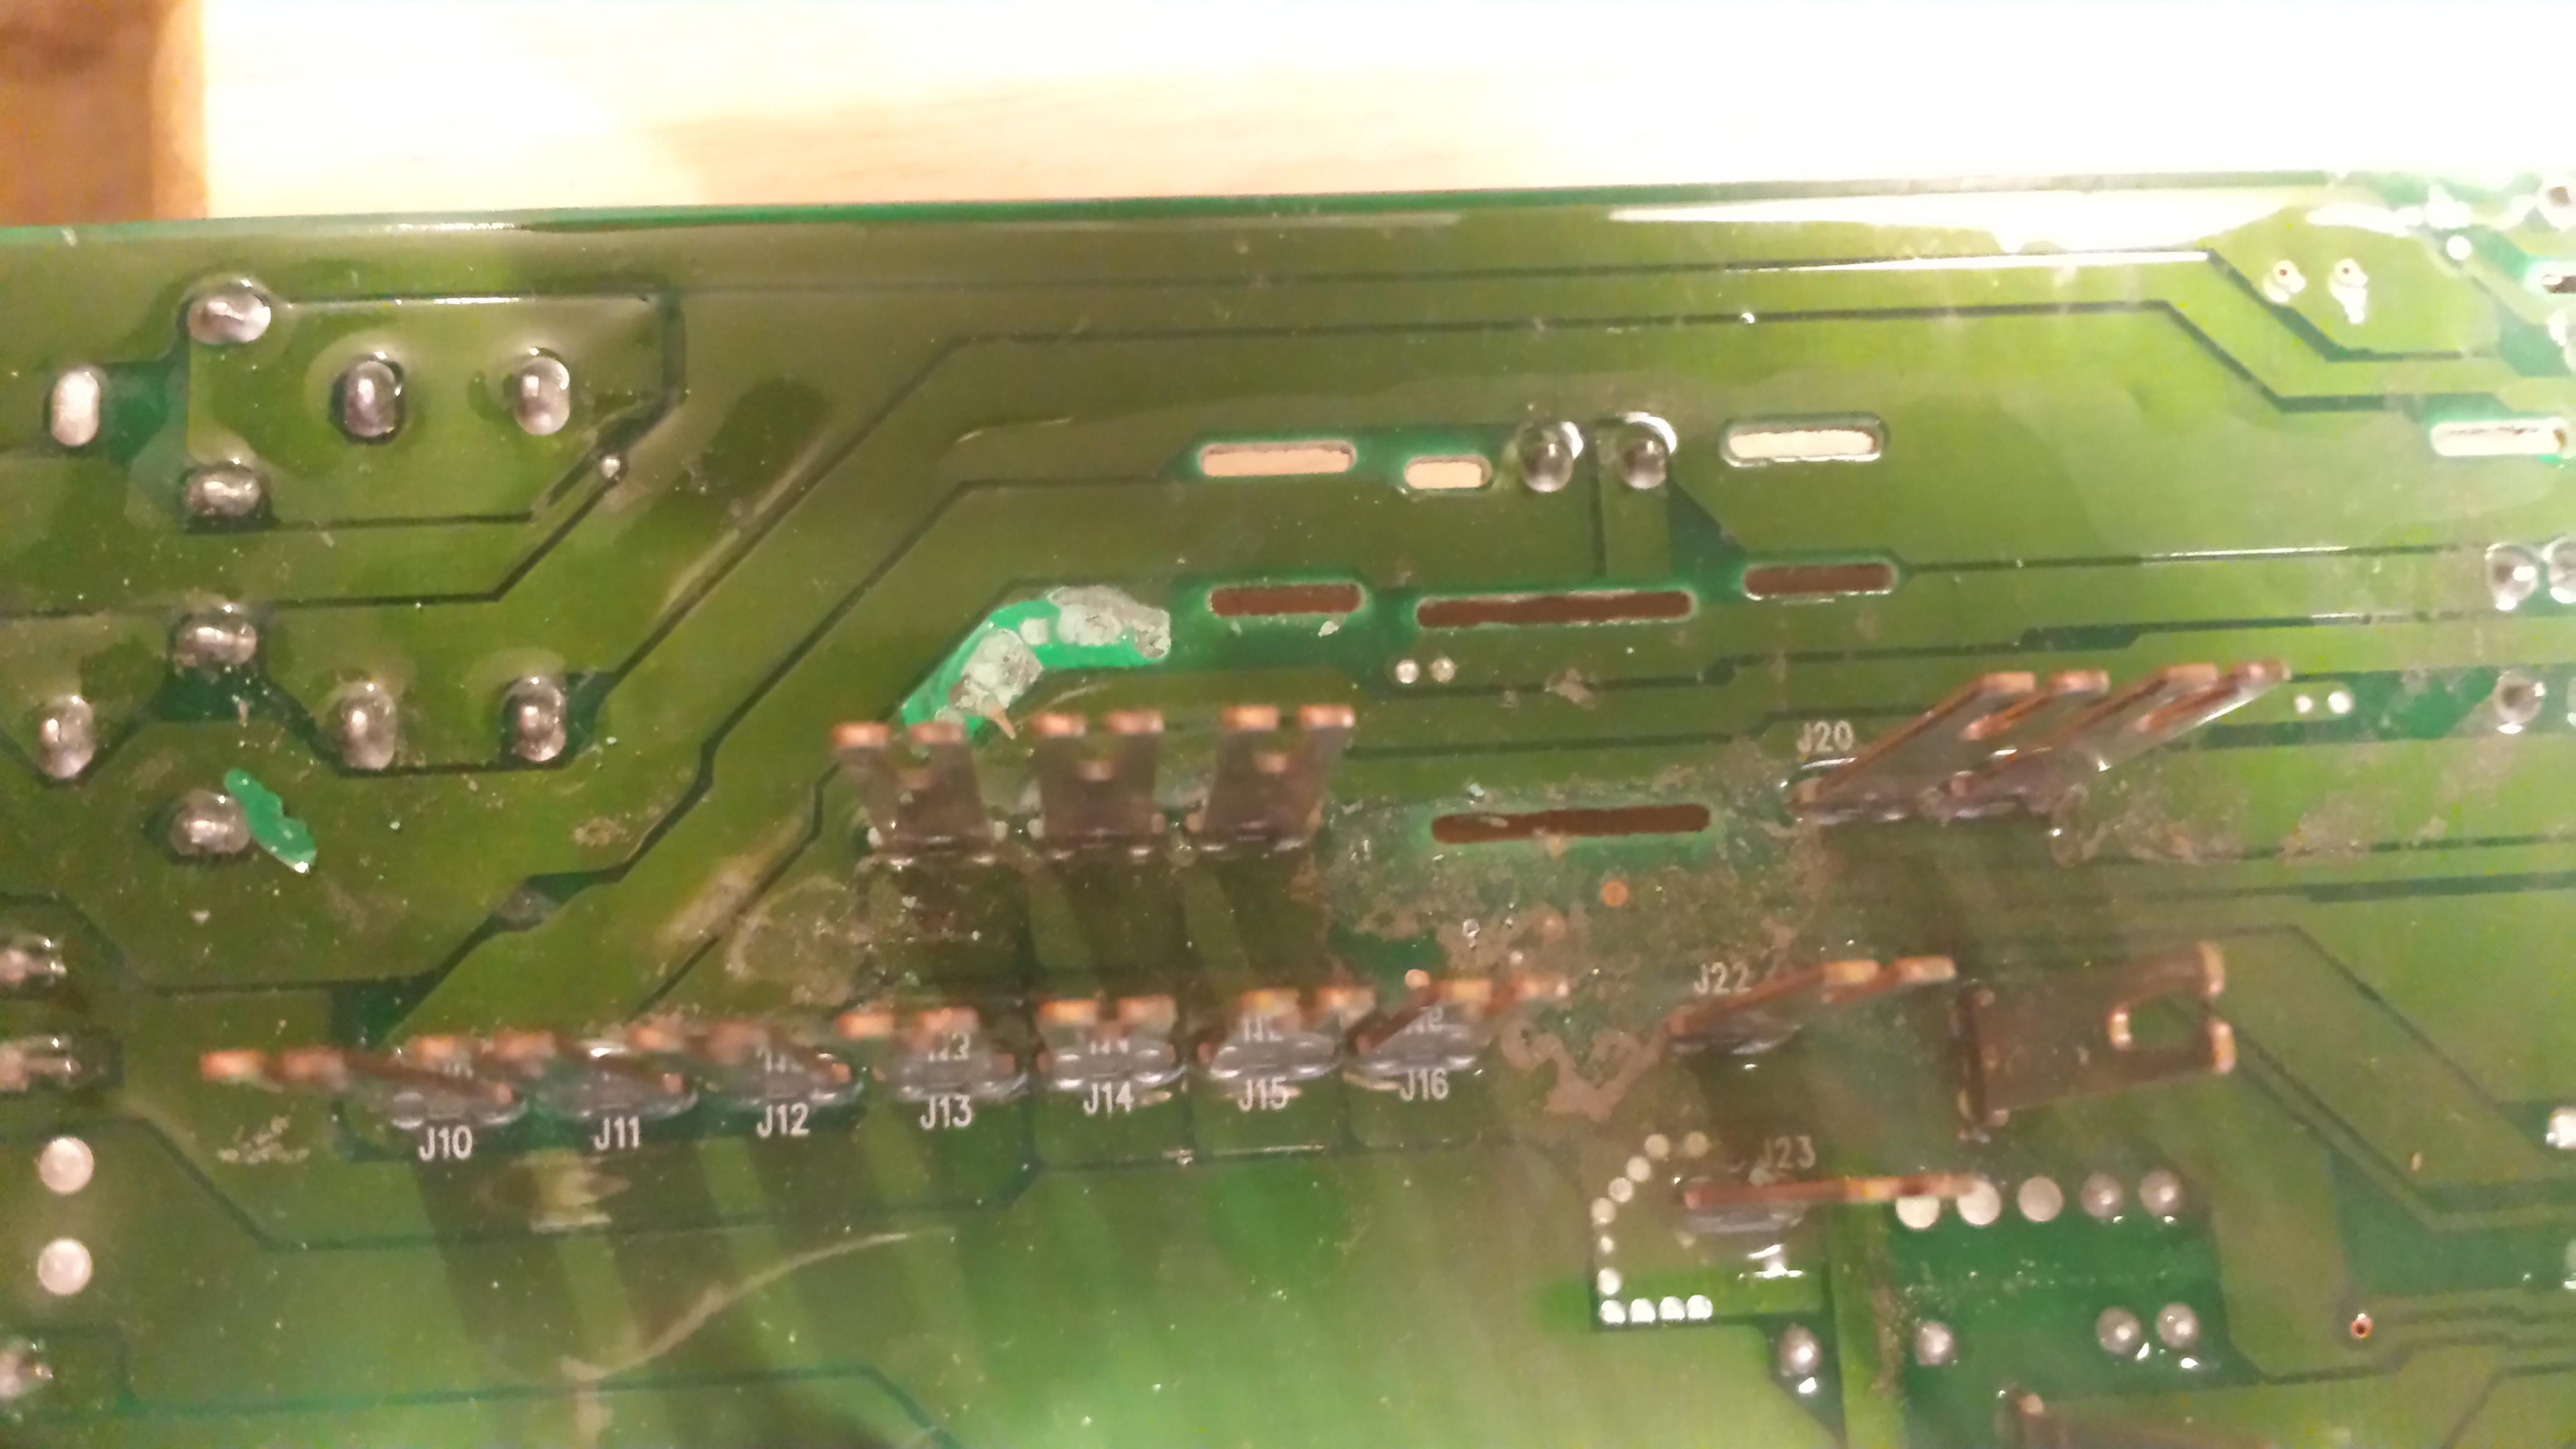 Ac Fuse Box Wiring Front Control Module Fcm Page 10 Dodgeforum Com